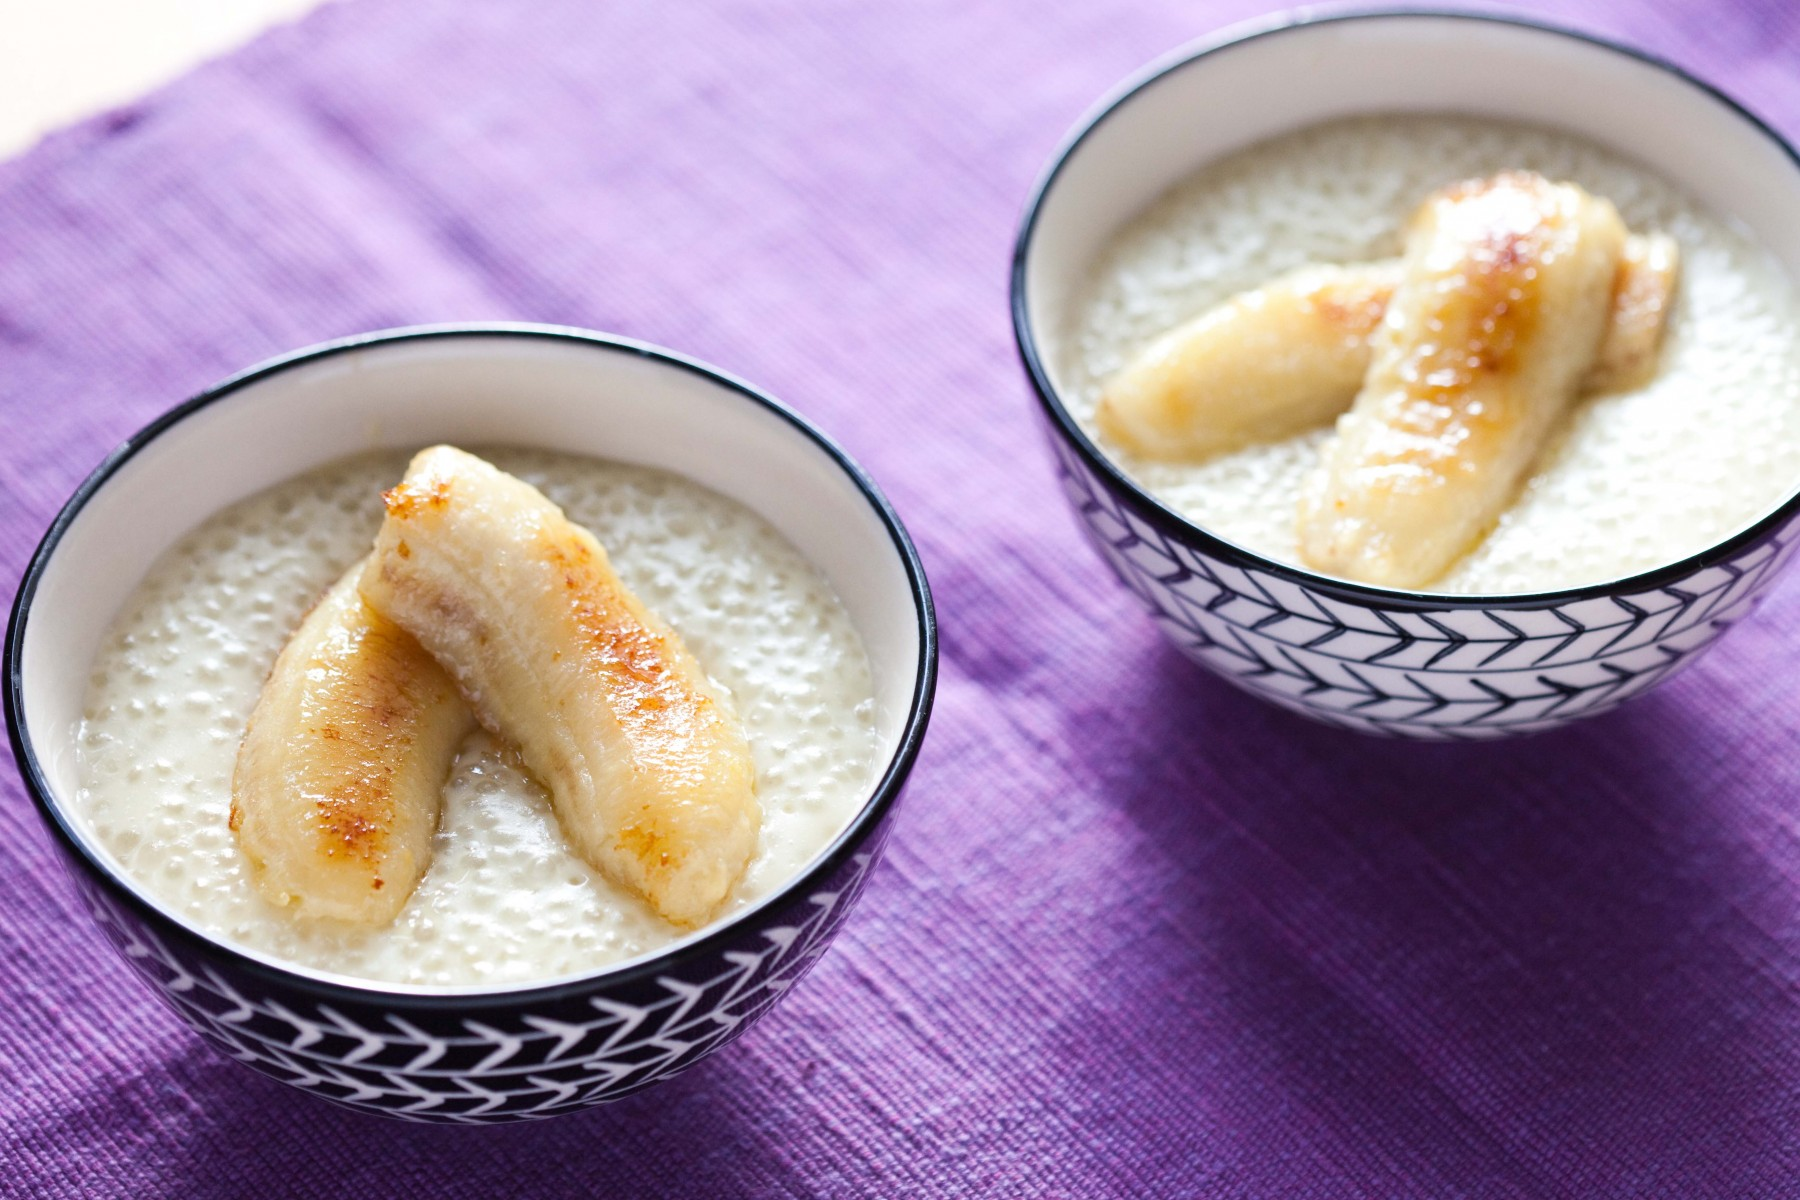 kokosowy-pudding-z-tapioki